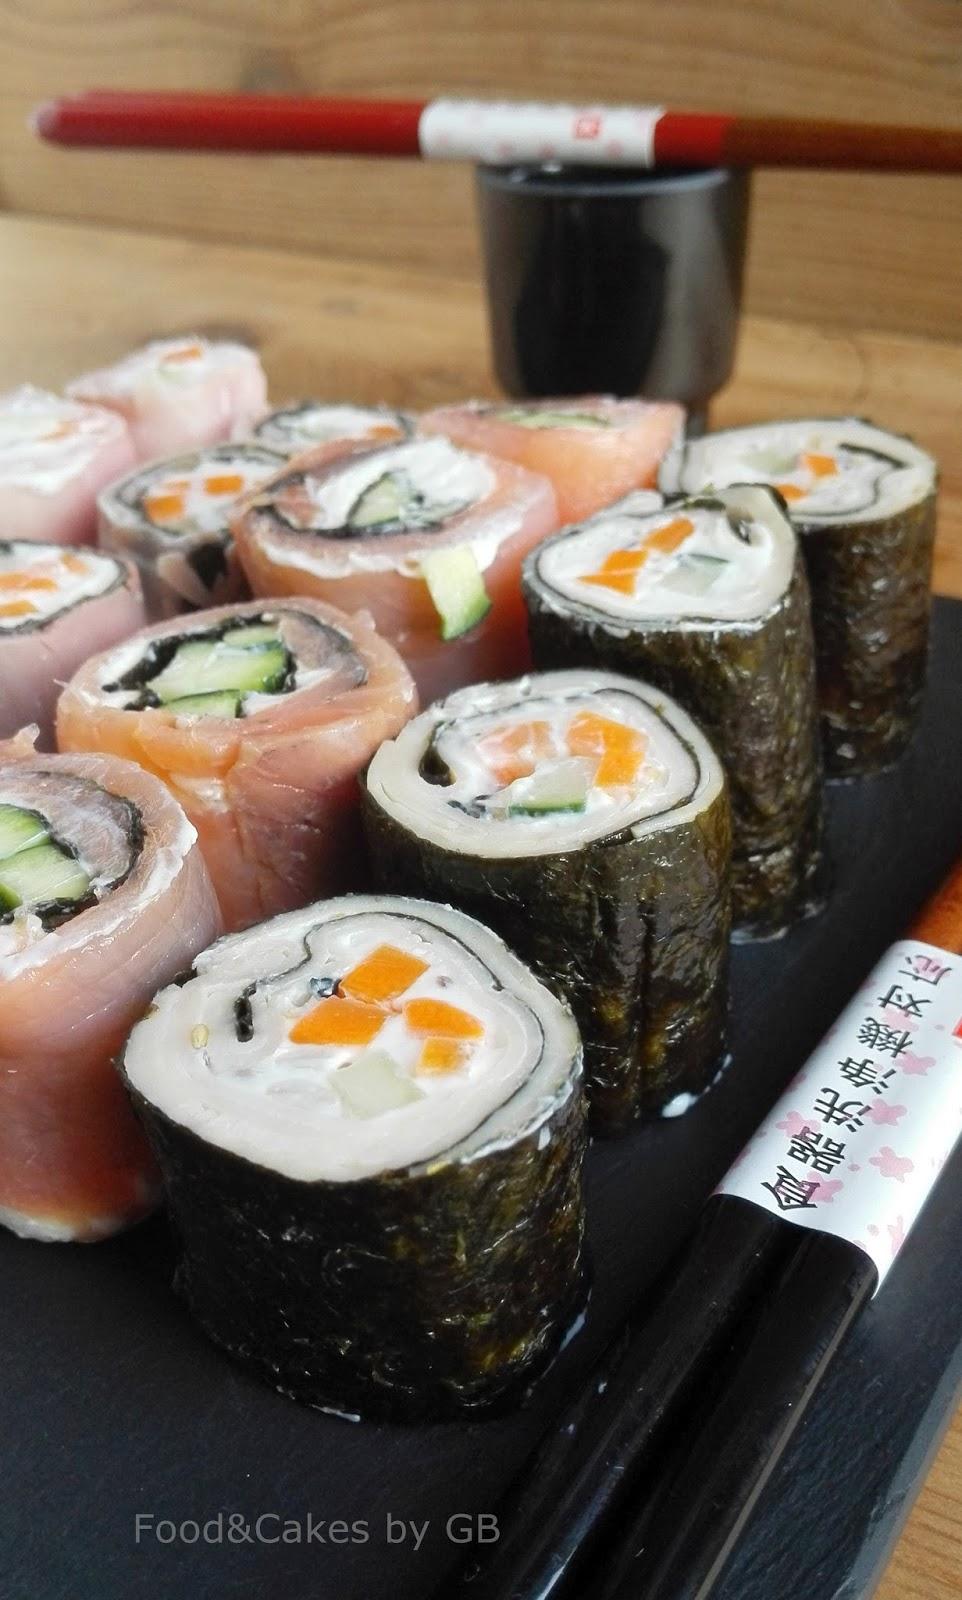 Food cakes sushi falso con queso descremado y - Cocinar sushi facil ...